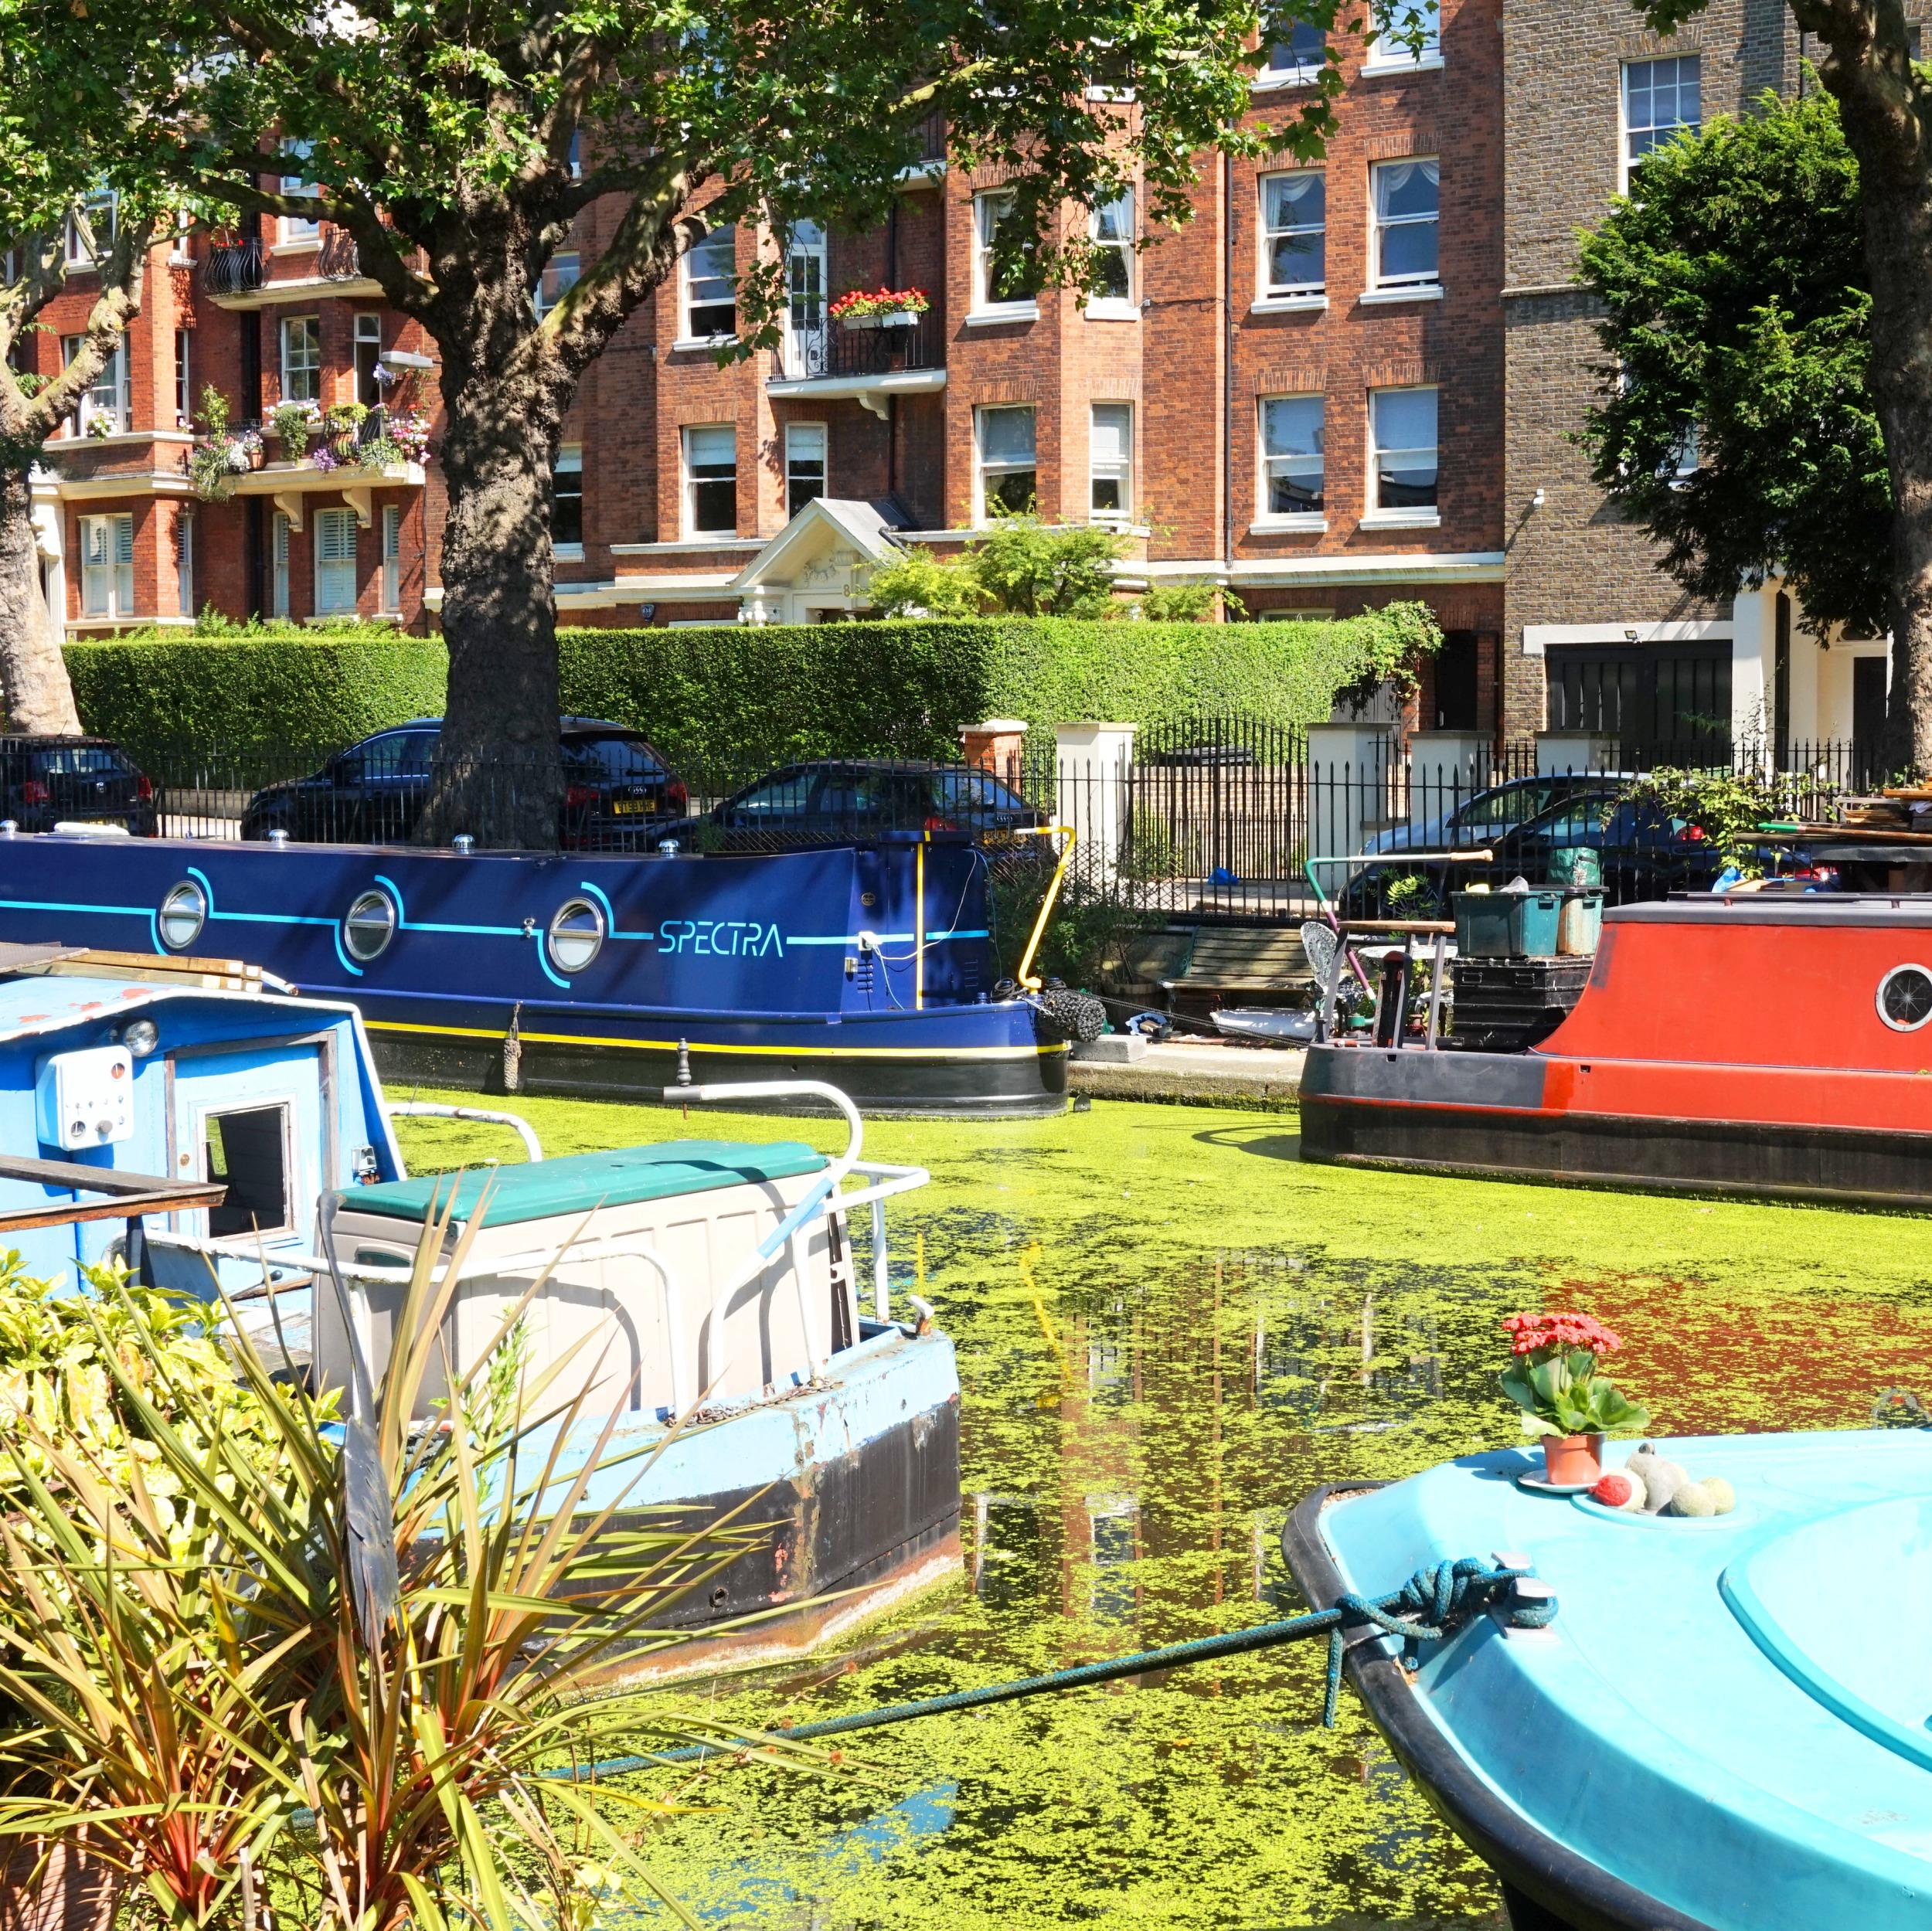 Regents-Canal-26